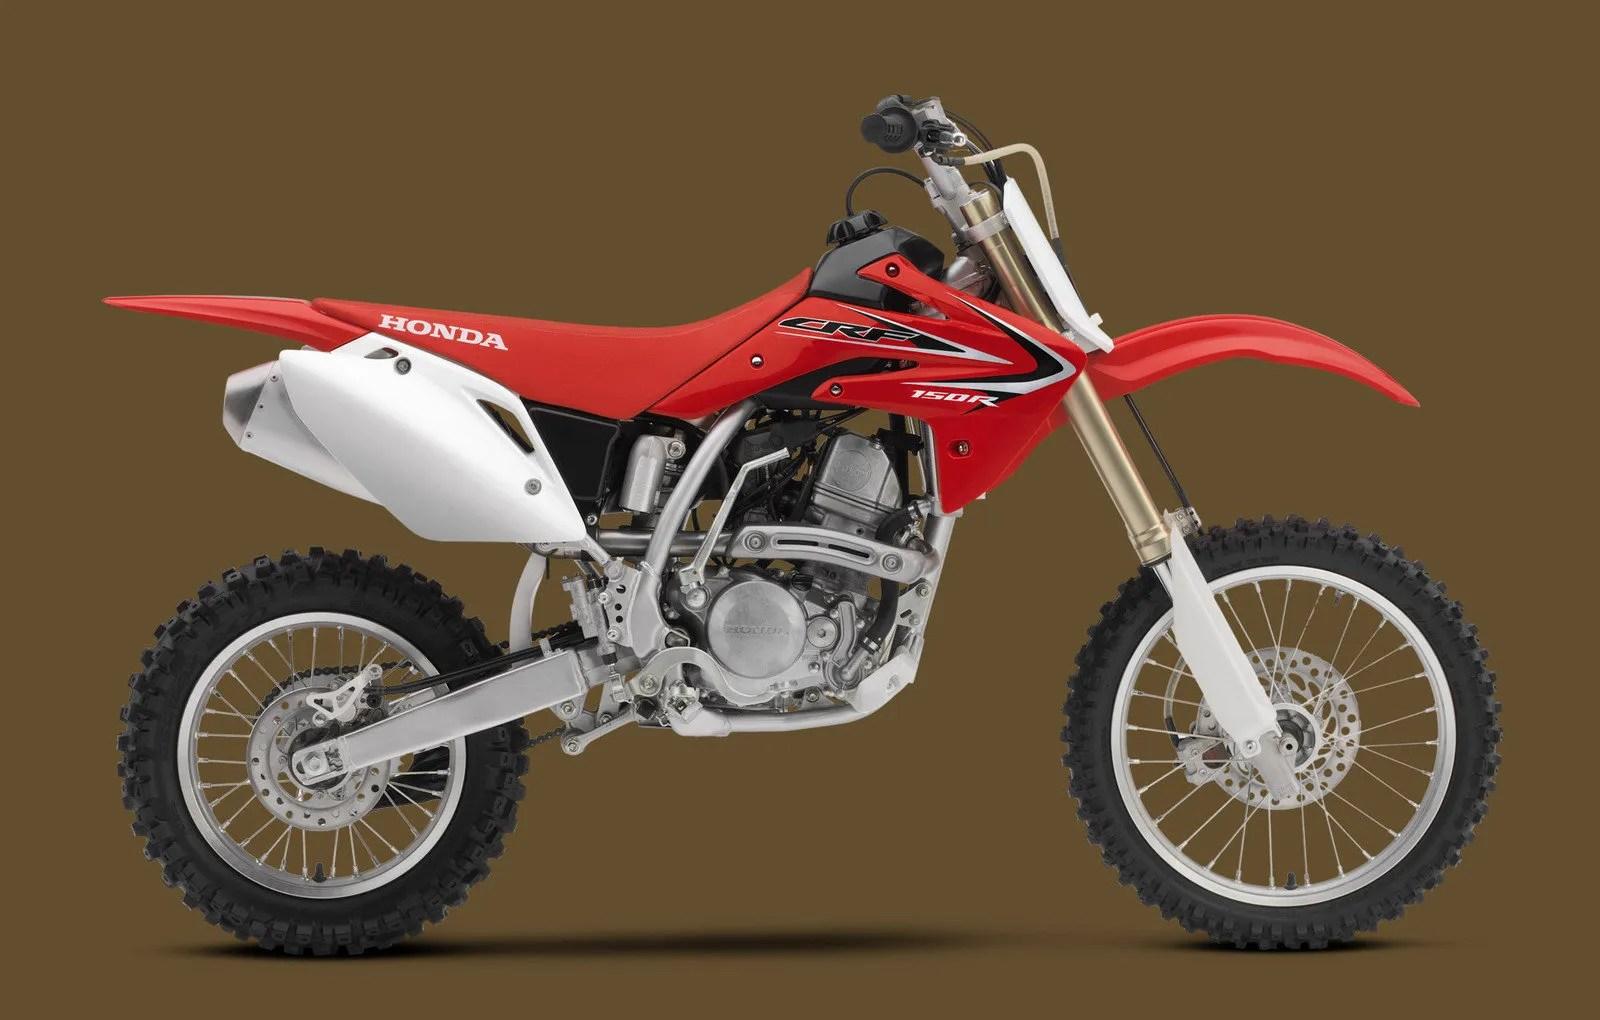 hight resolution of 2014 honda crf150r top speed honda 150 motorcycles motor wiring 89 ford f